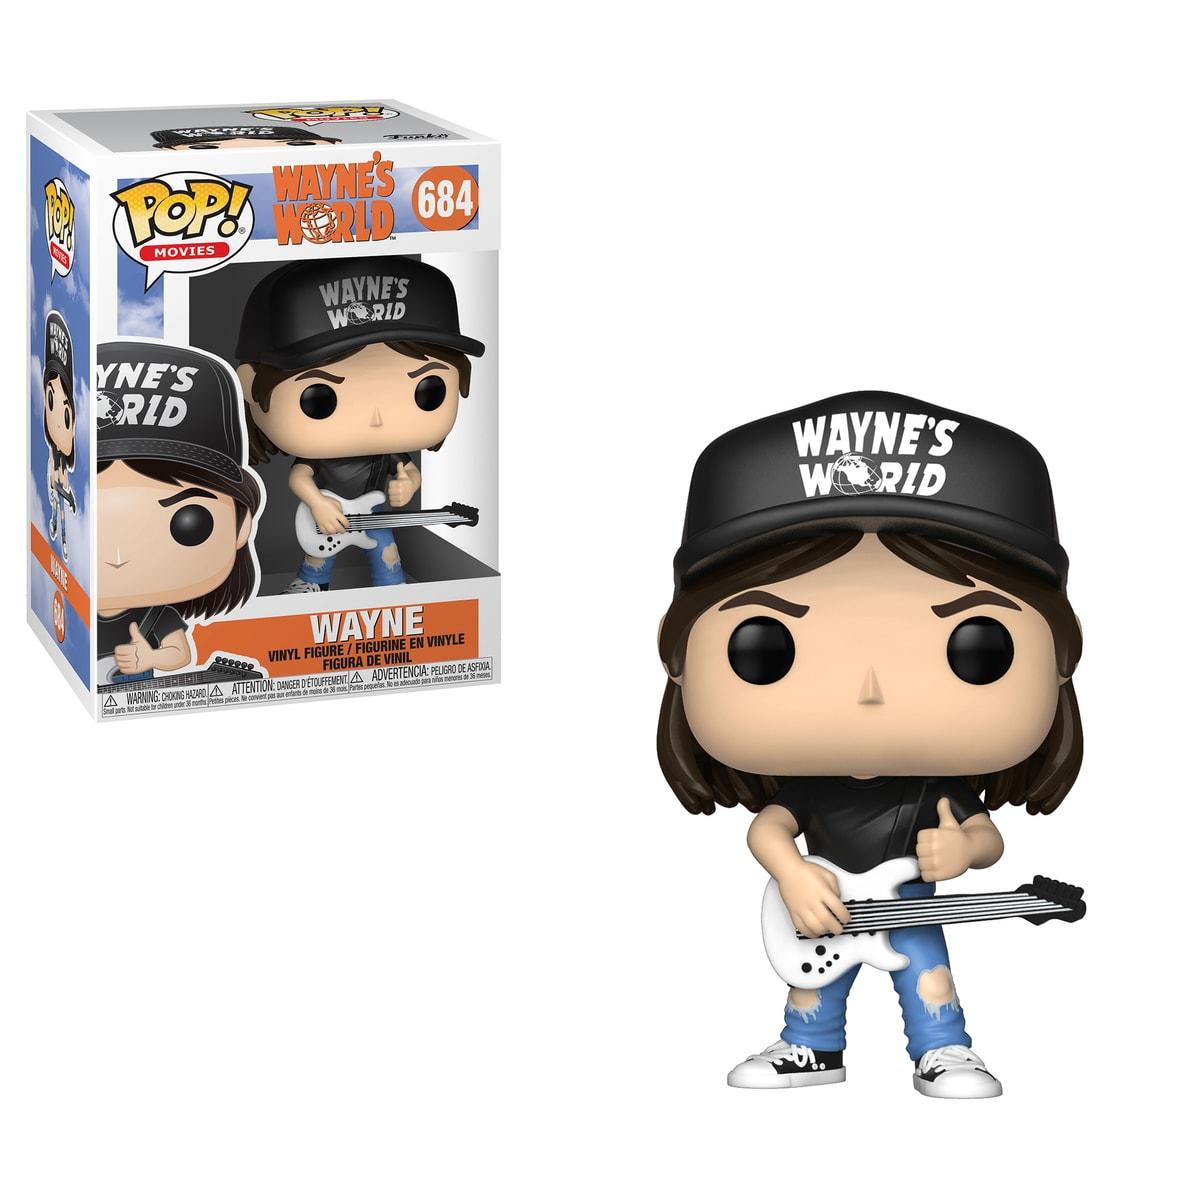 Funko POP Movie: Wayne's World - Wayne